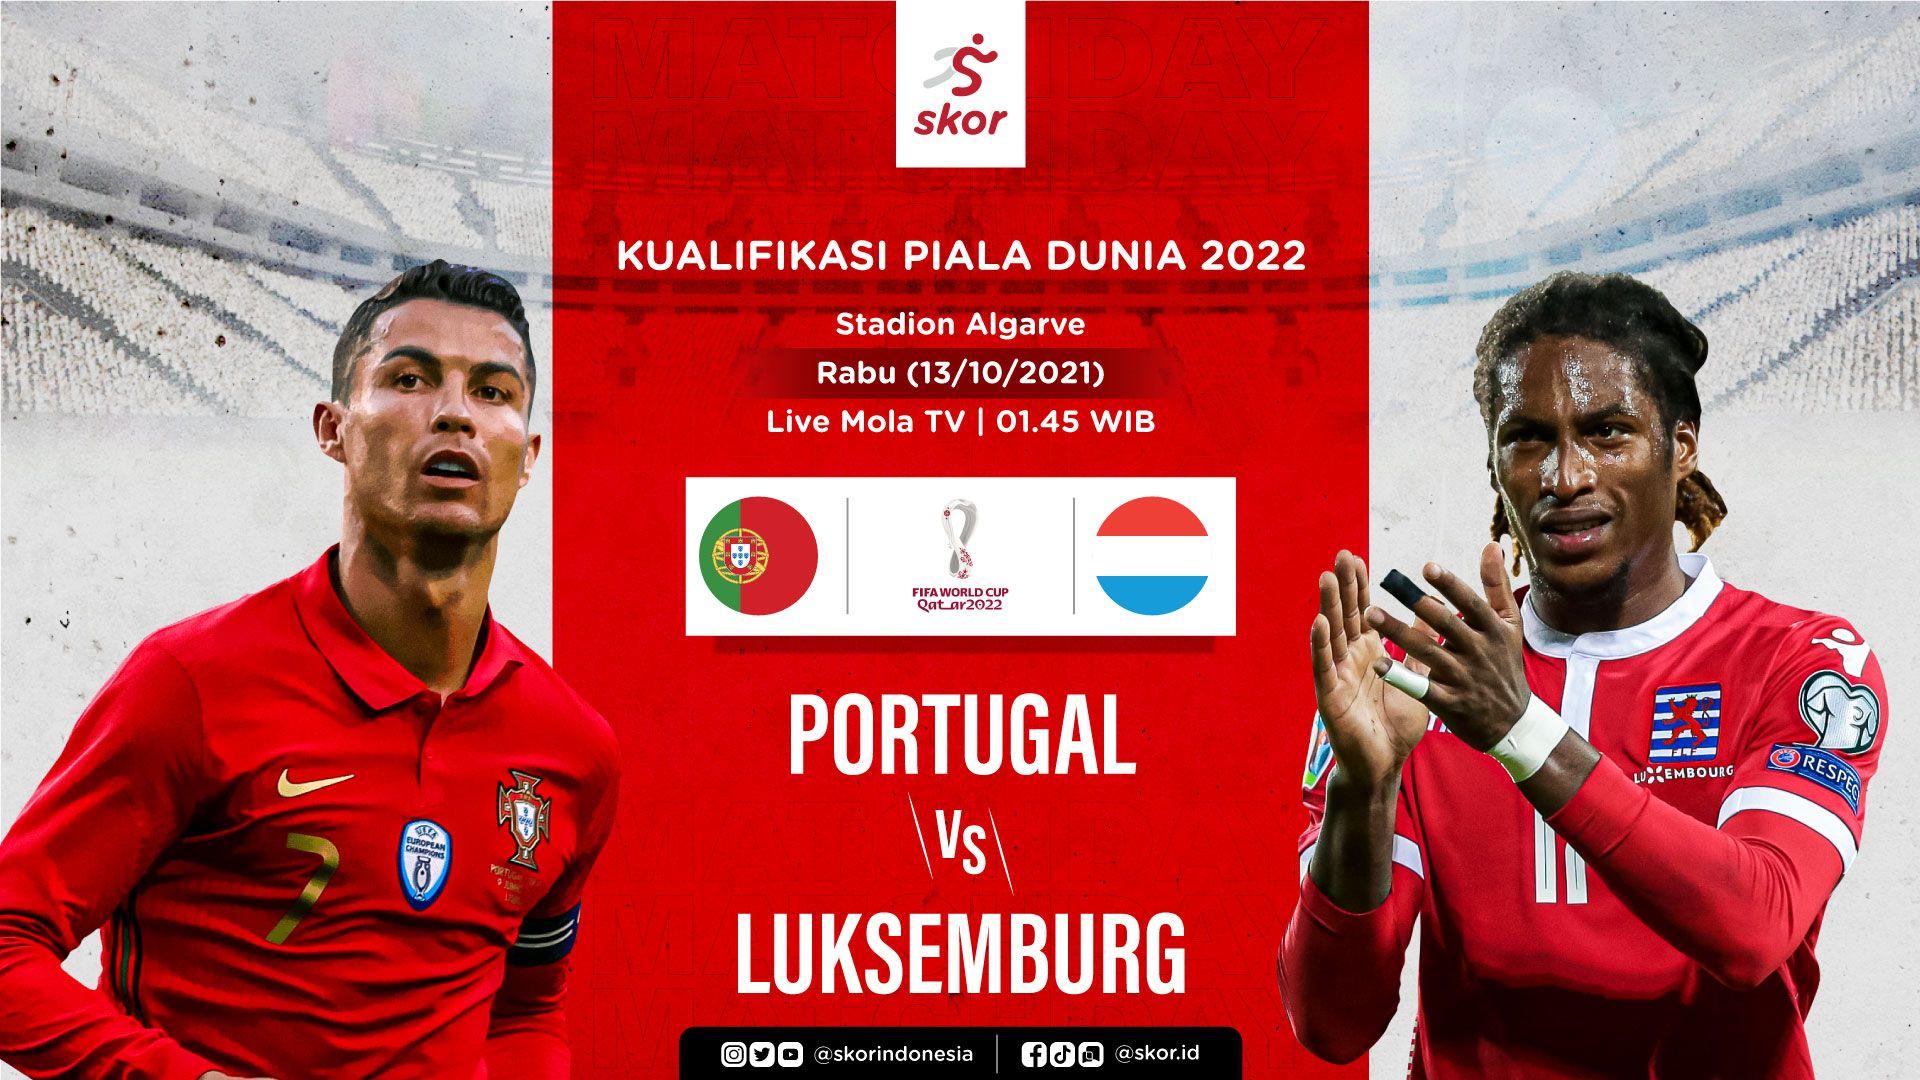 https://perontokbandartogel.com/hasil-portugal-vs-luksemburg-5-0/